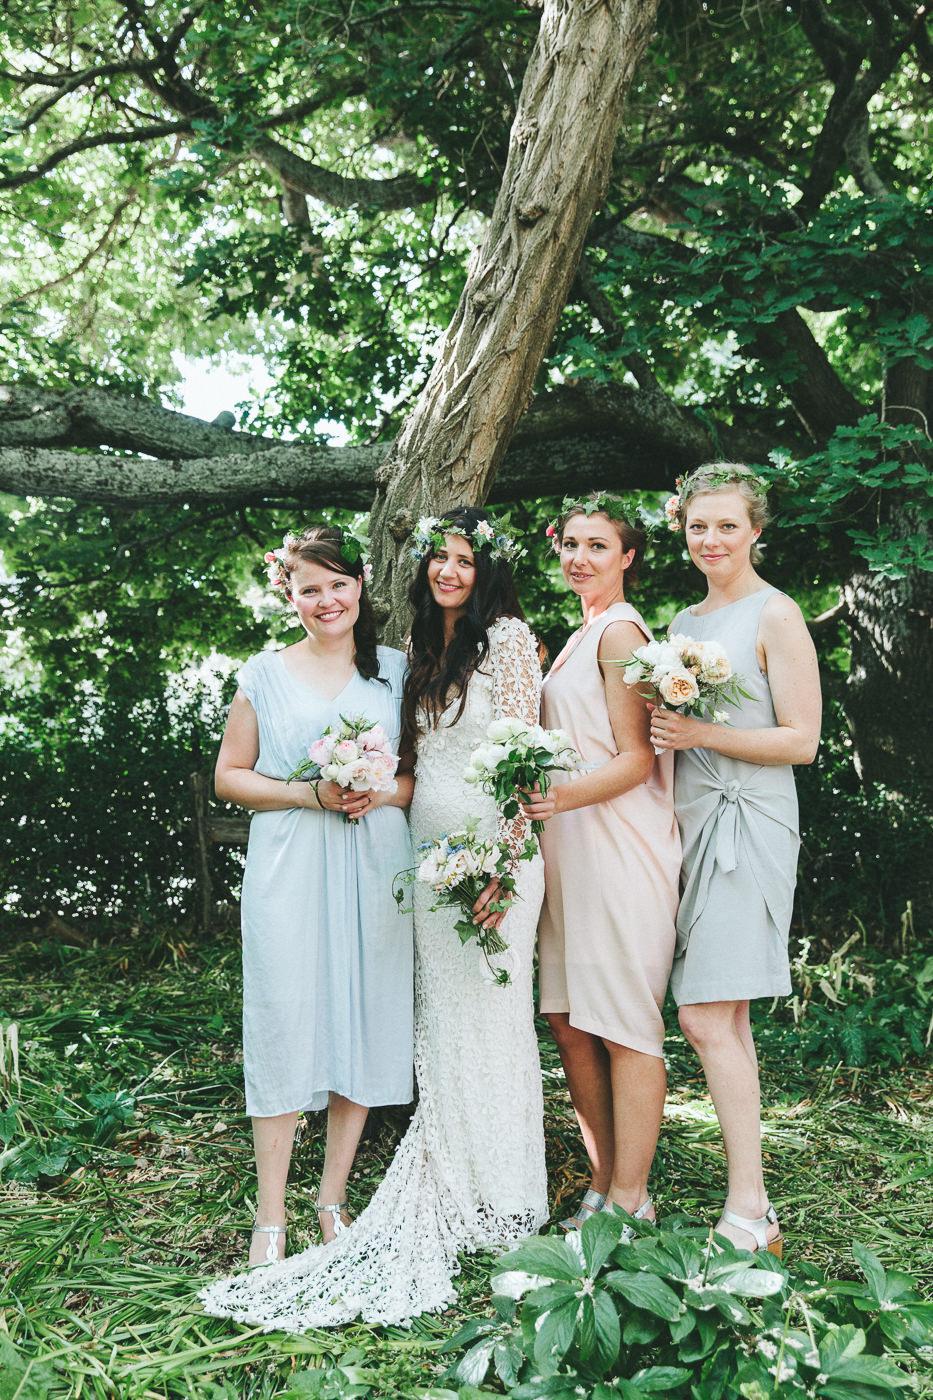 Bride and Bridesmaids in a Tasmanian garden